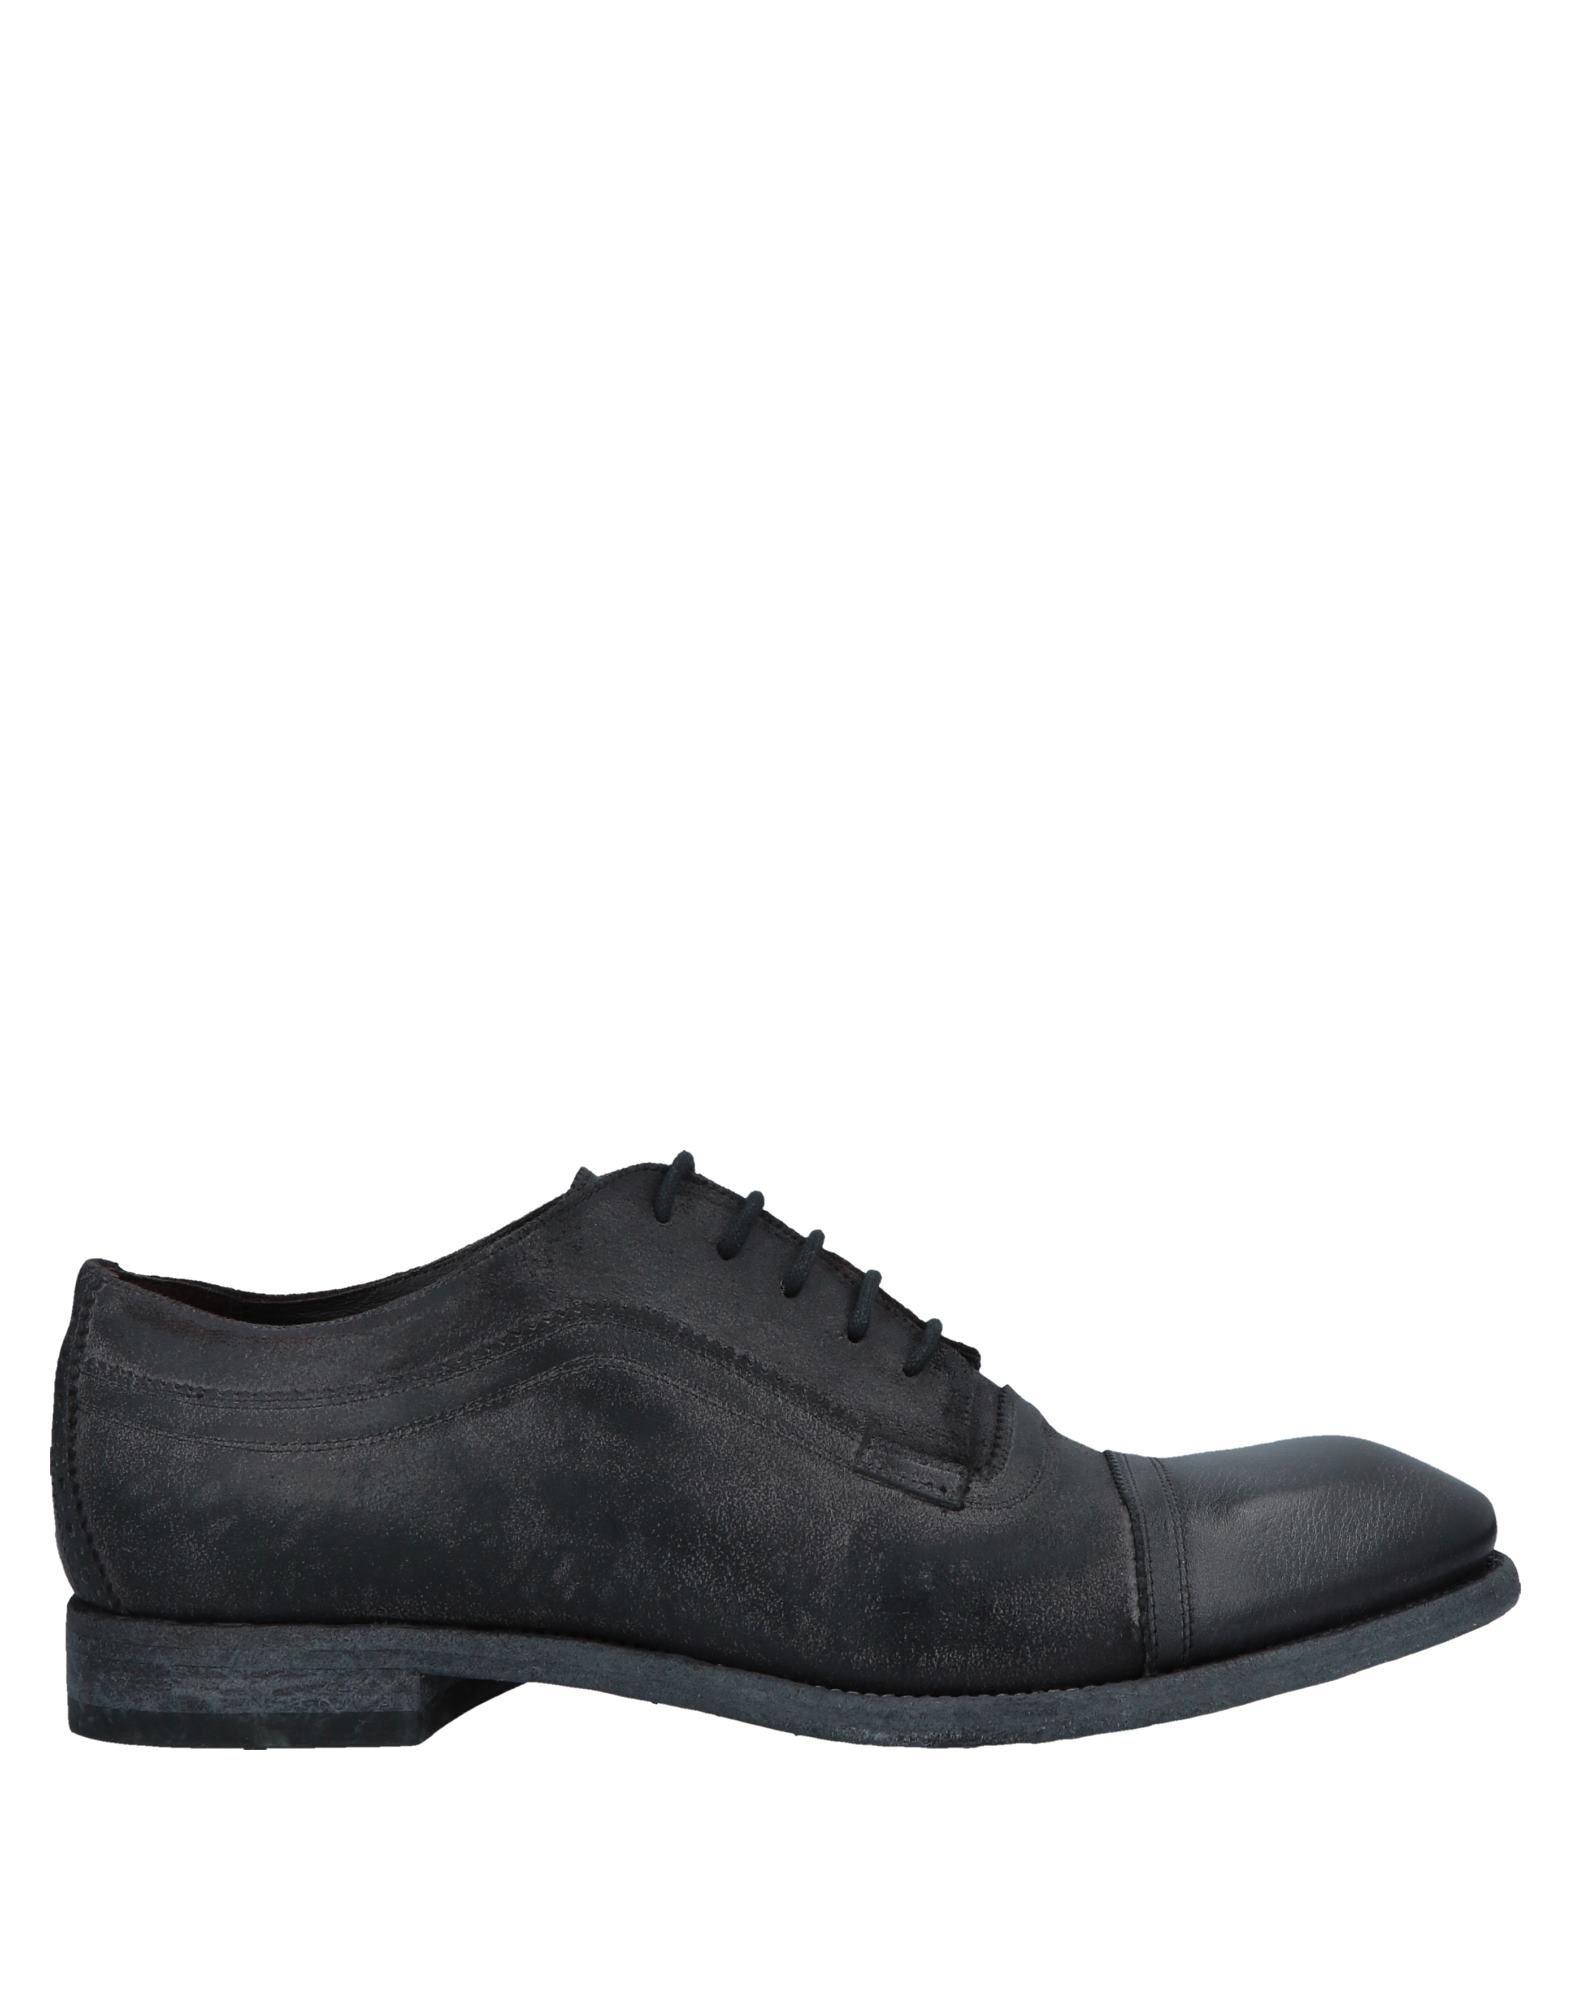 CAVALLINI Обувь на шнурках обувь 2015 тренды